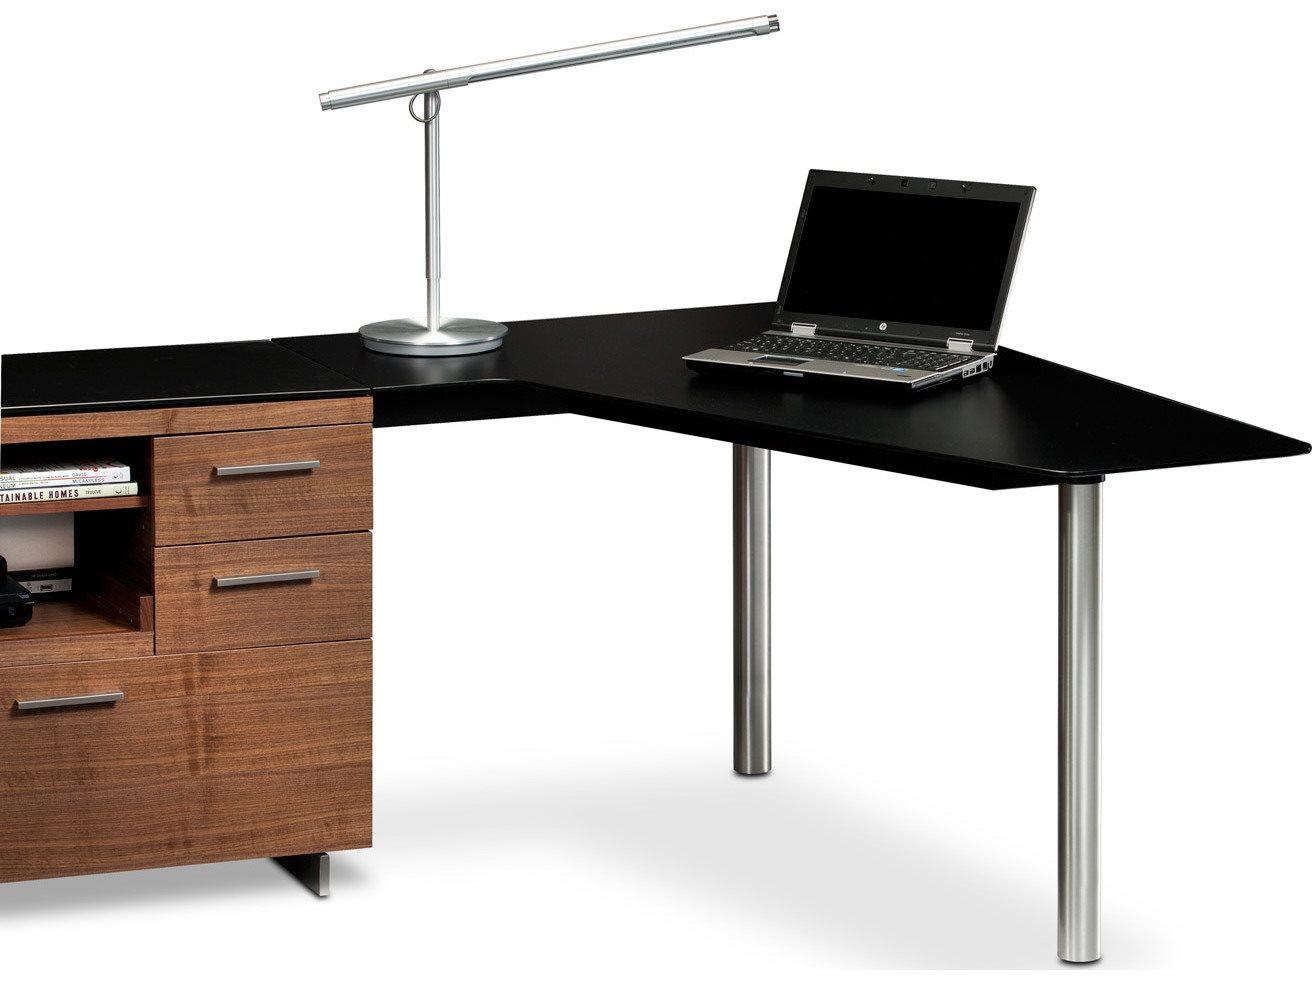 Bdi Sequel 38 39 39 X 55 39 39 Black Peninsula Desk Bdi6018